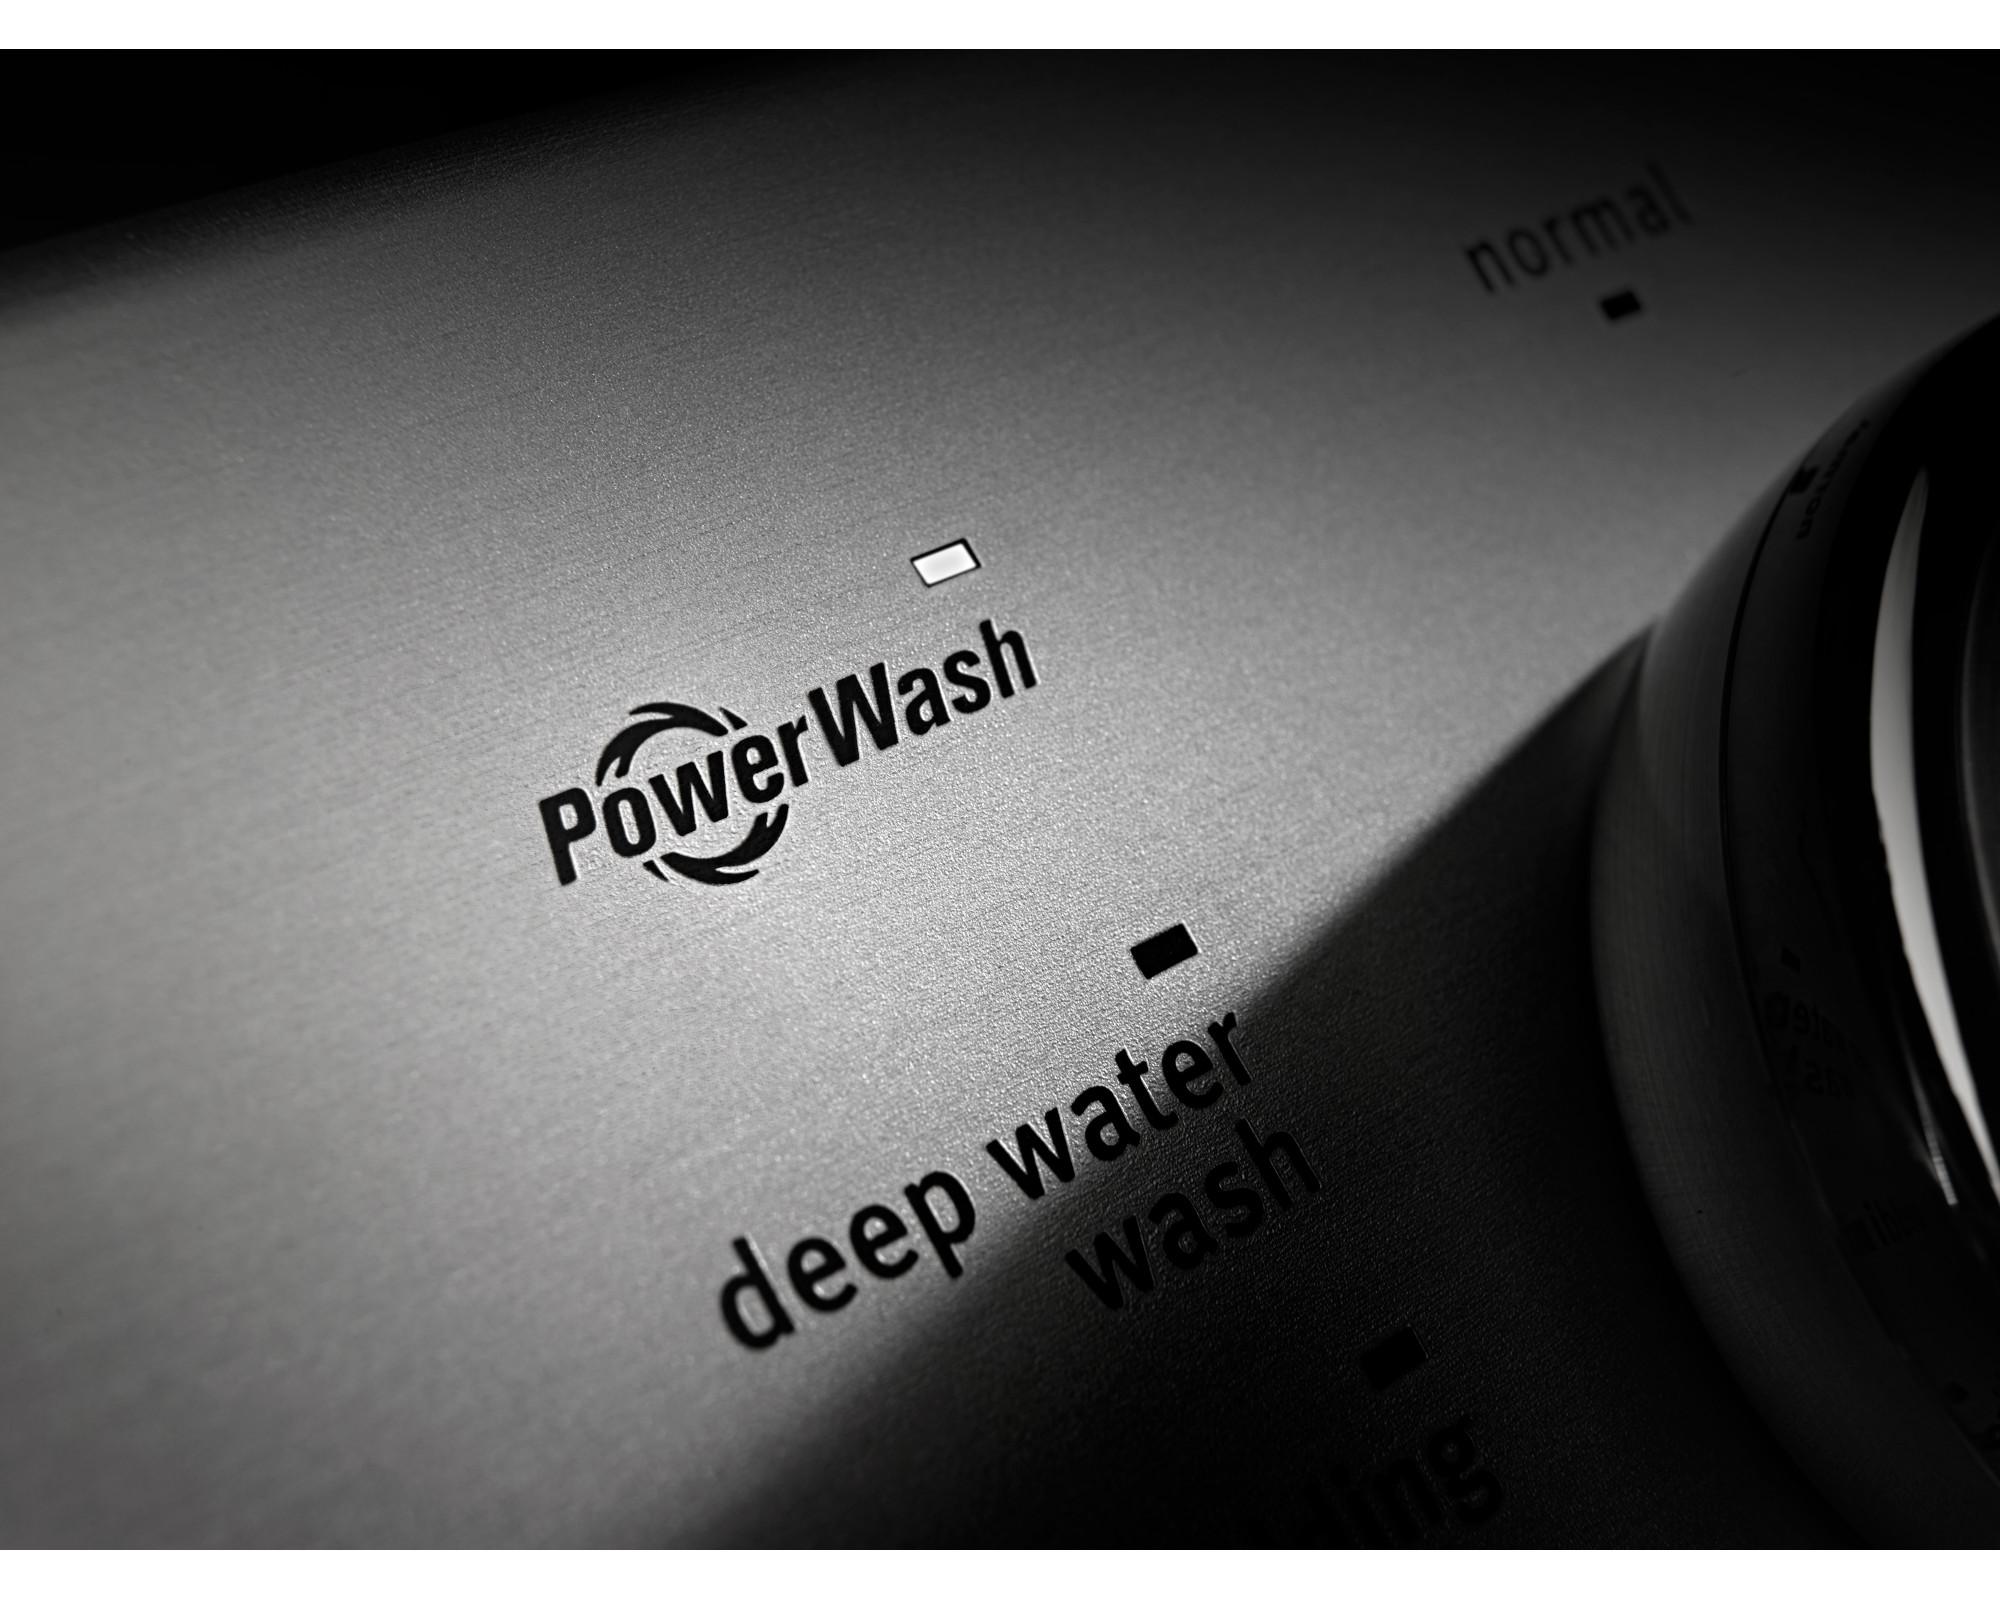 Maytag MVWB855DW 5.3 cu. ft. Top Load Washer - White